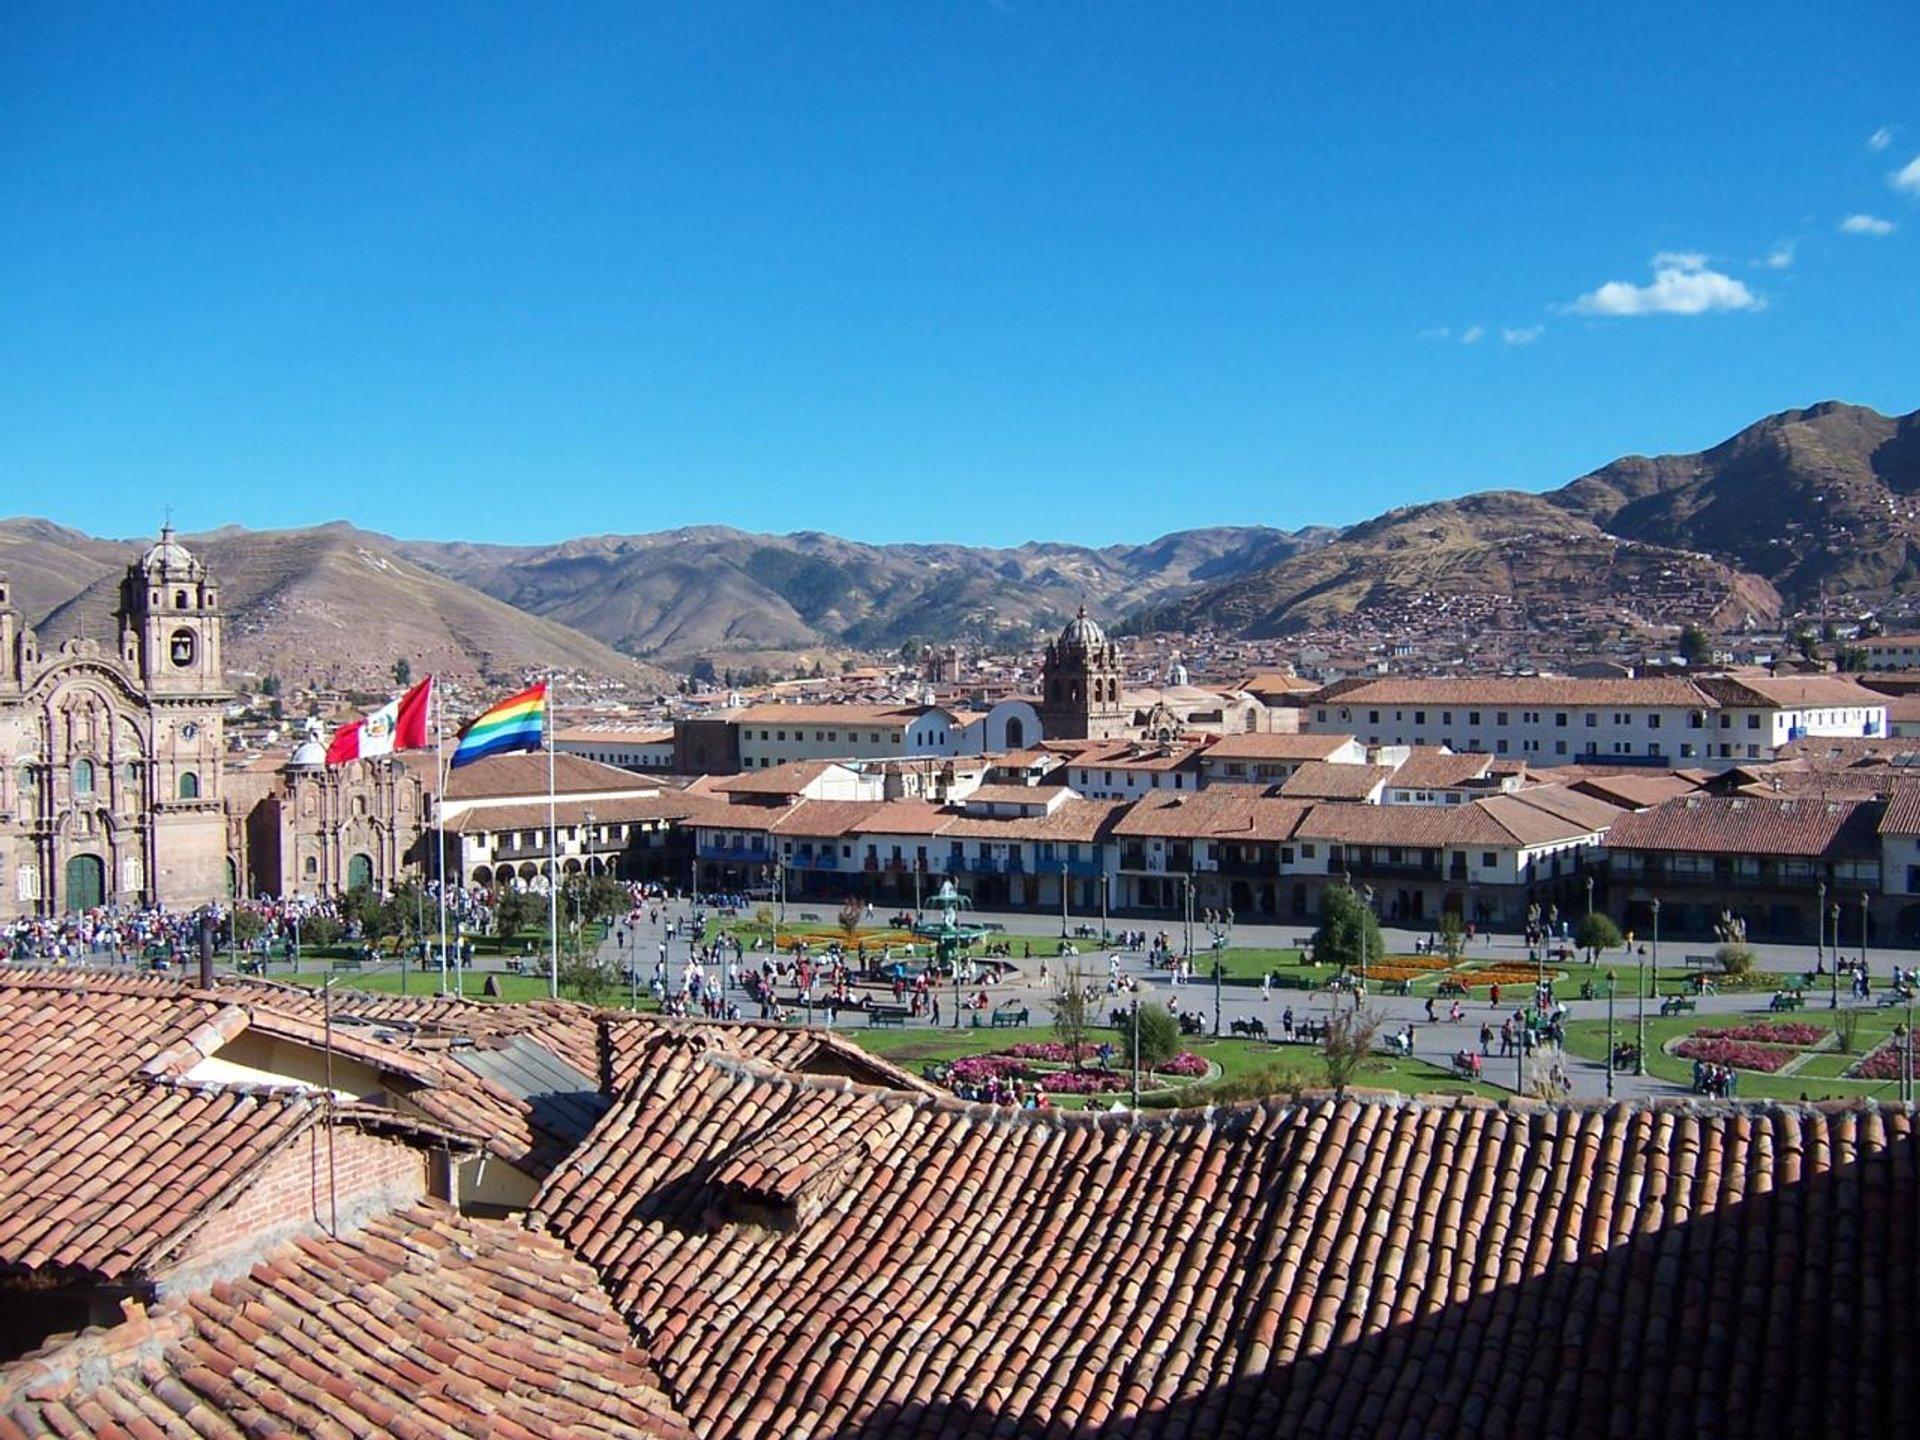 Dry Season in Machu Picchu and Cusco 2020 - Best Time